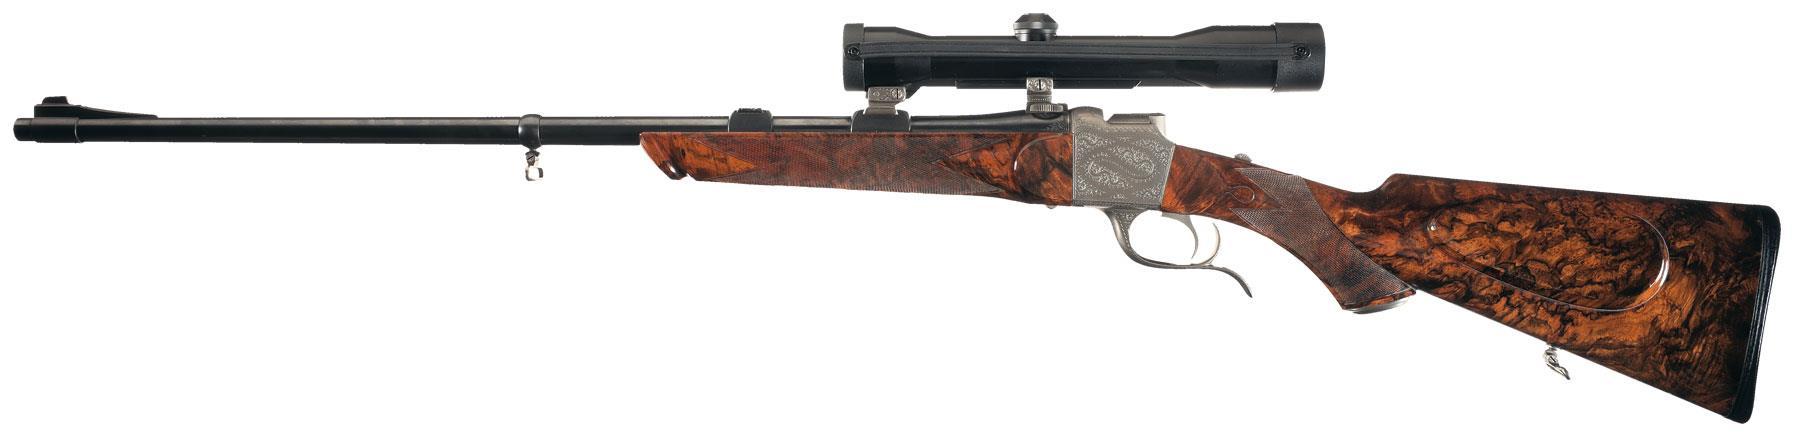 Hagn falling block rifle